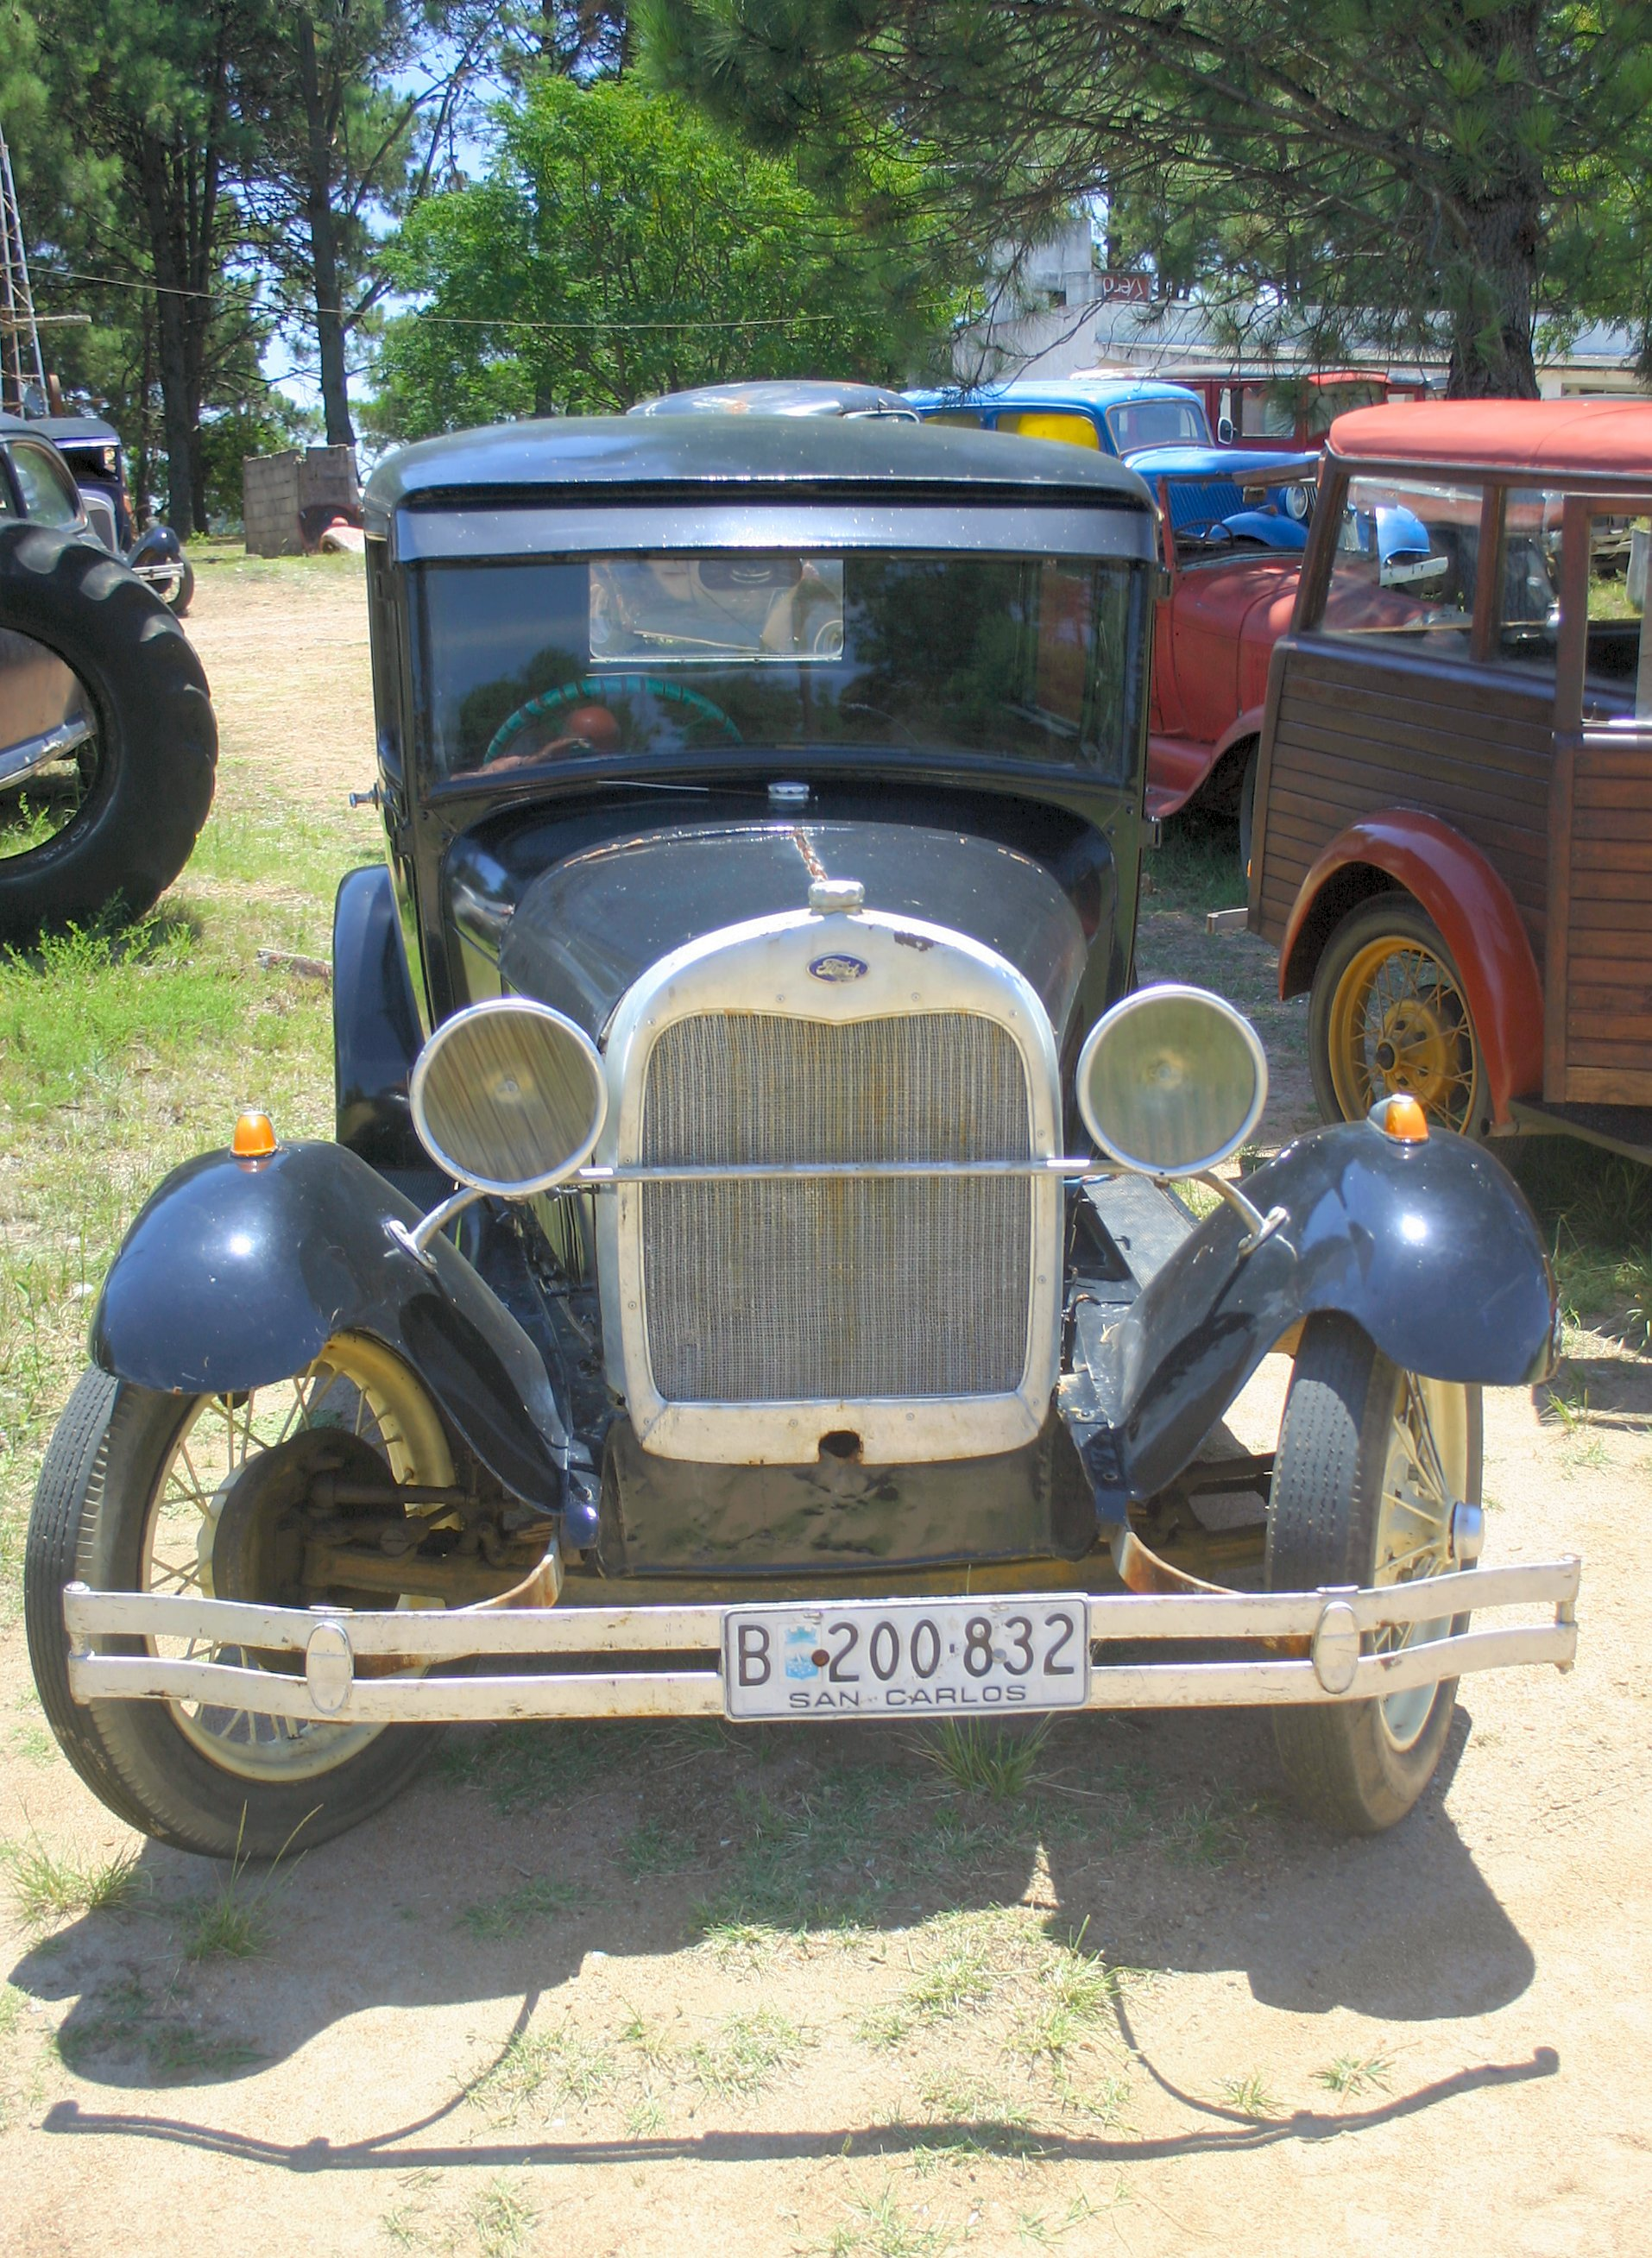 A history of ford motor company for Ford motor company history